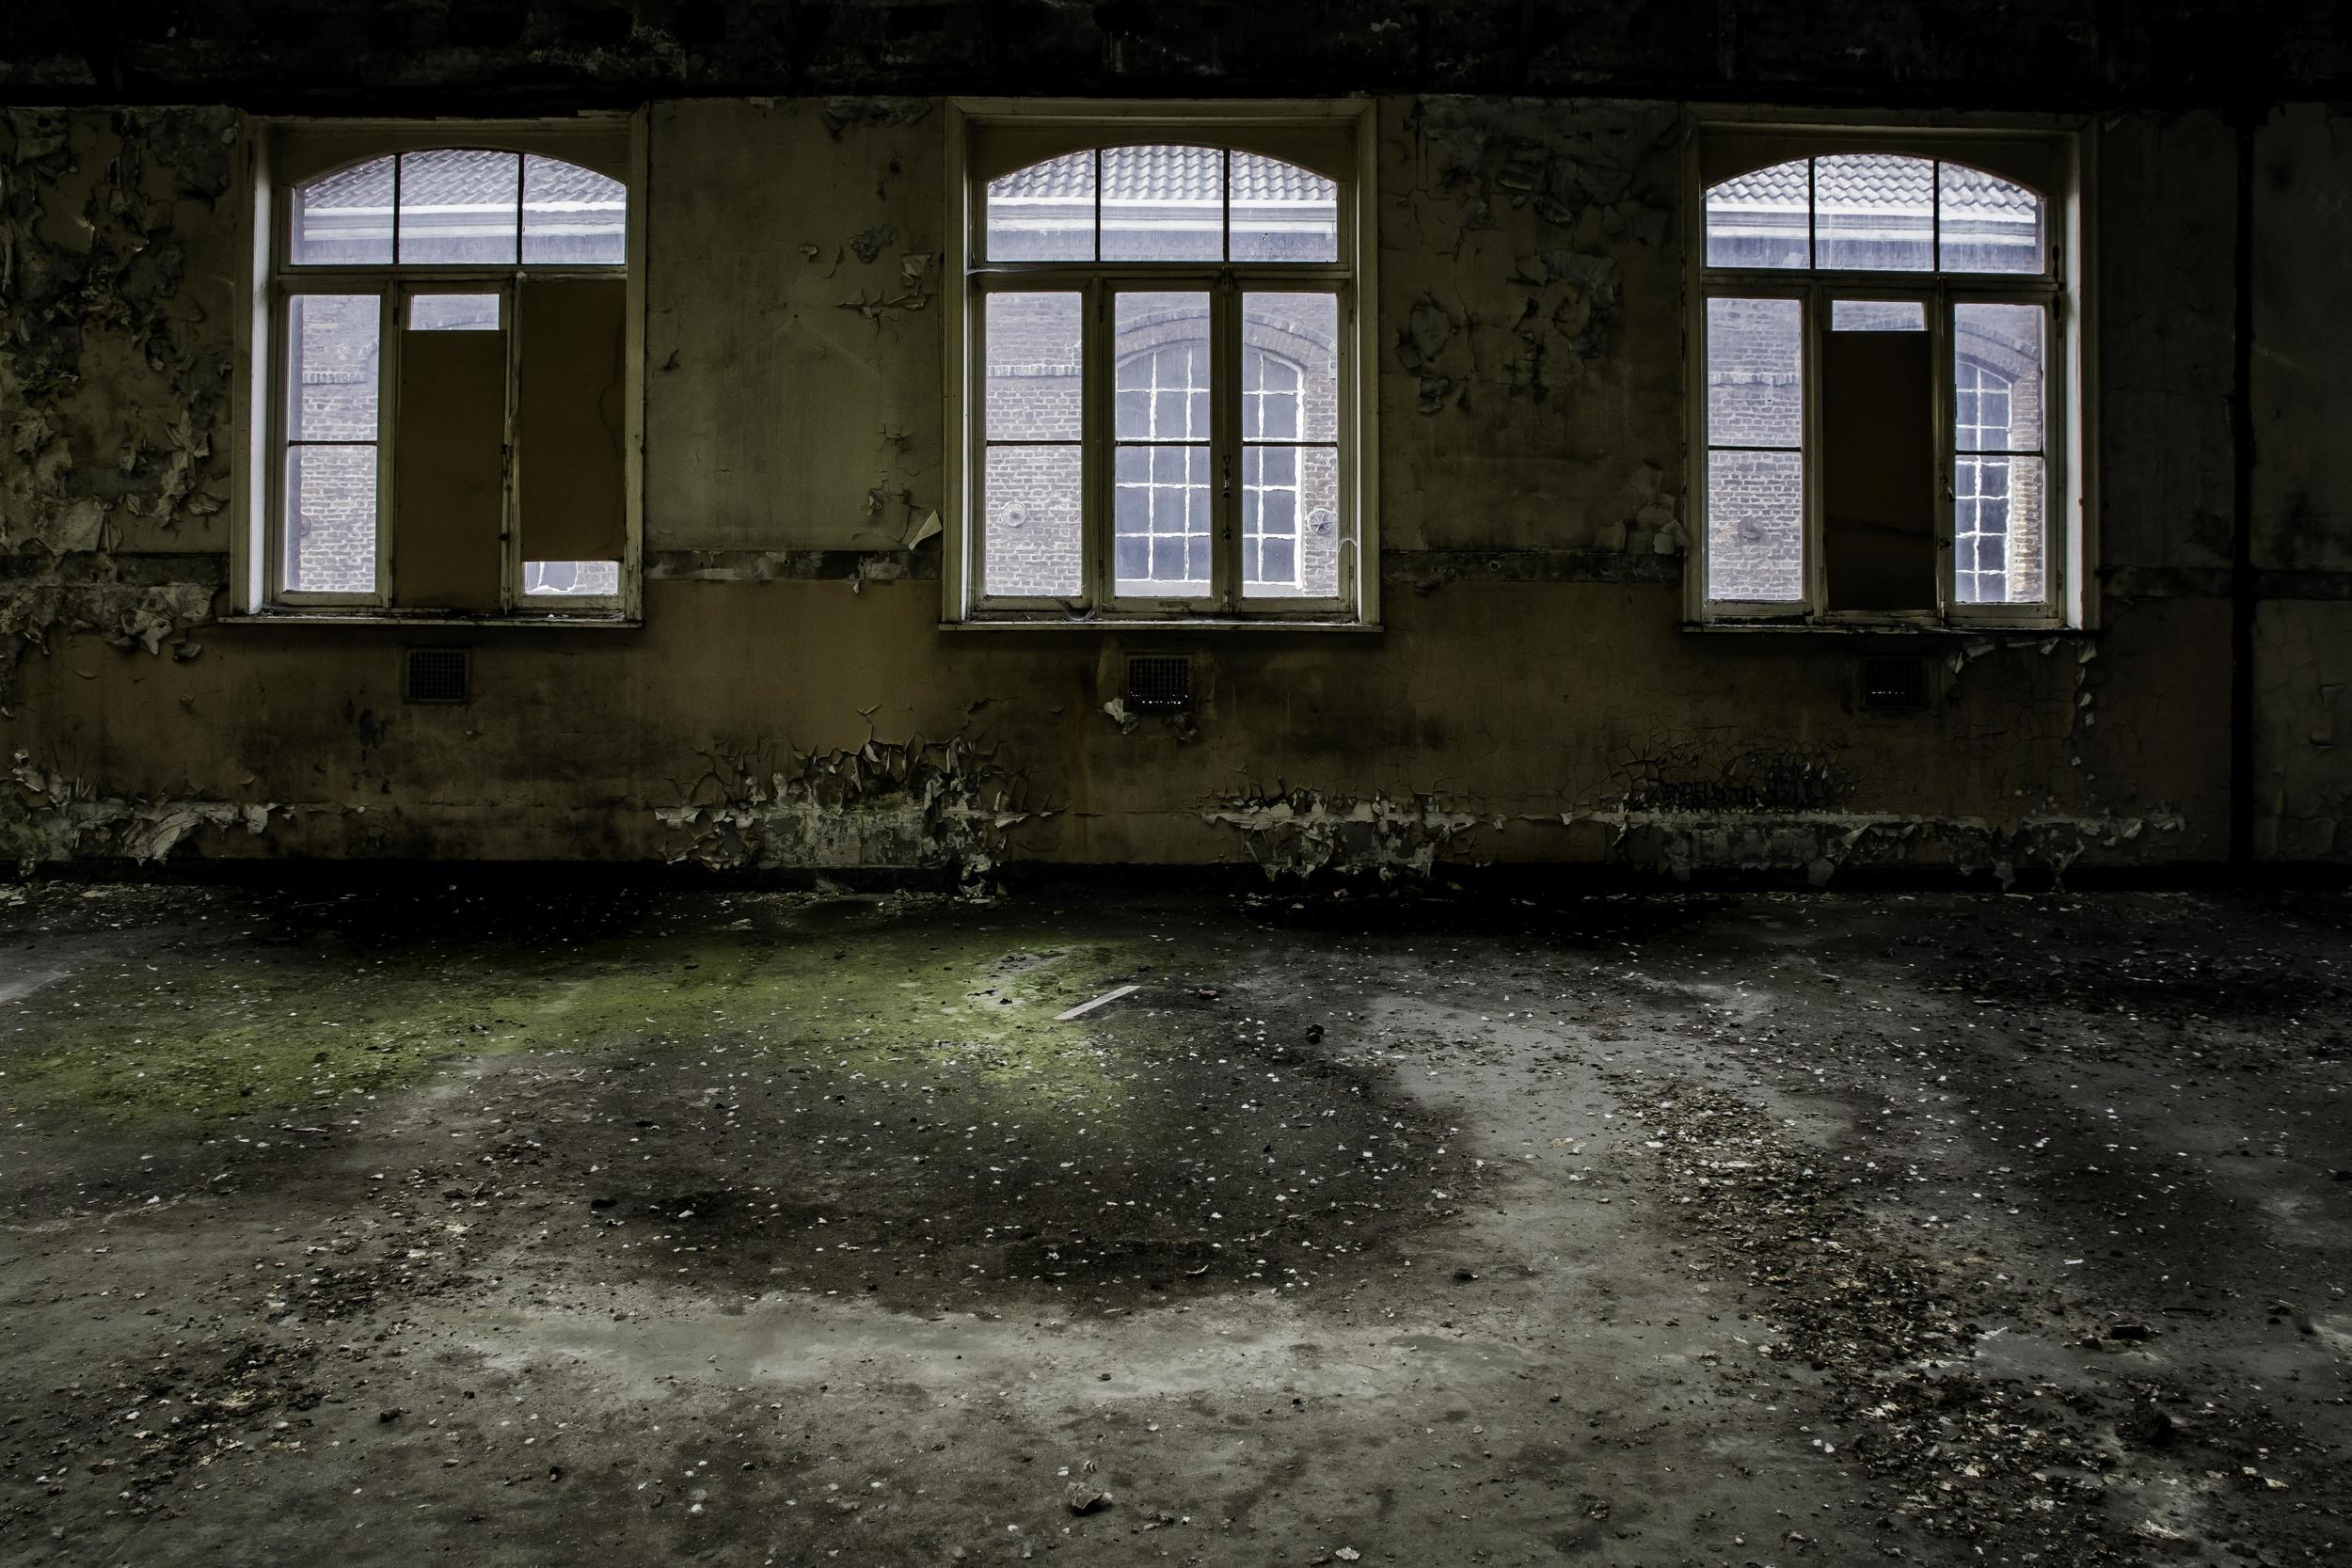 viewfinder-eigenzinnige-fotografie-urbex-vergane-glorie-oude-papierfabriek-raam-atelier-boven